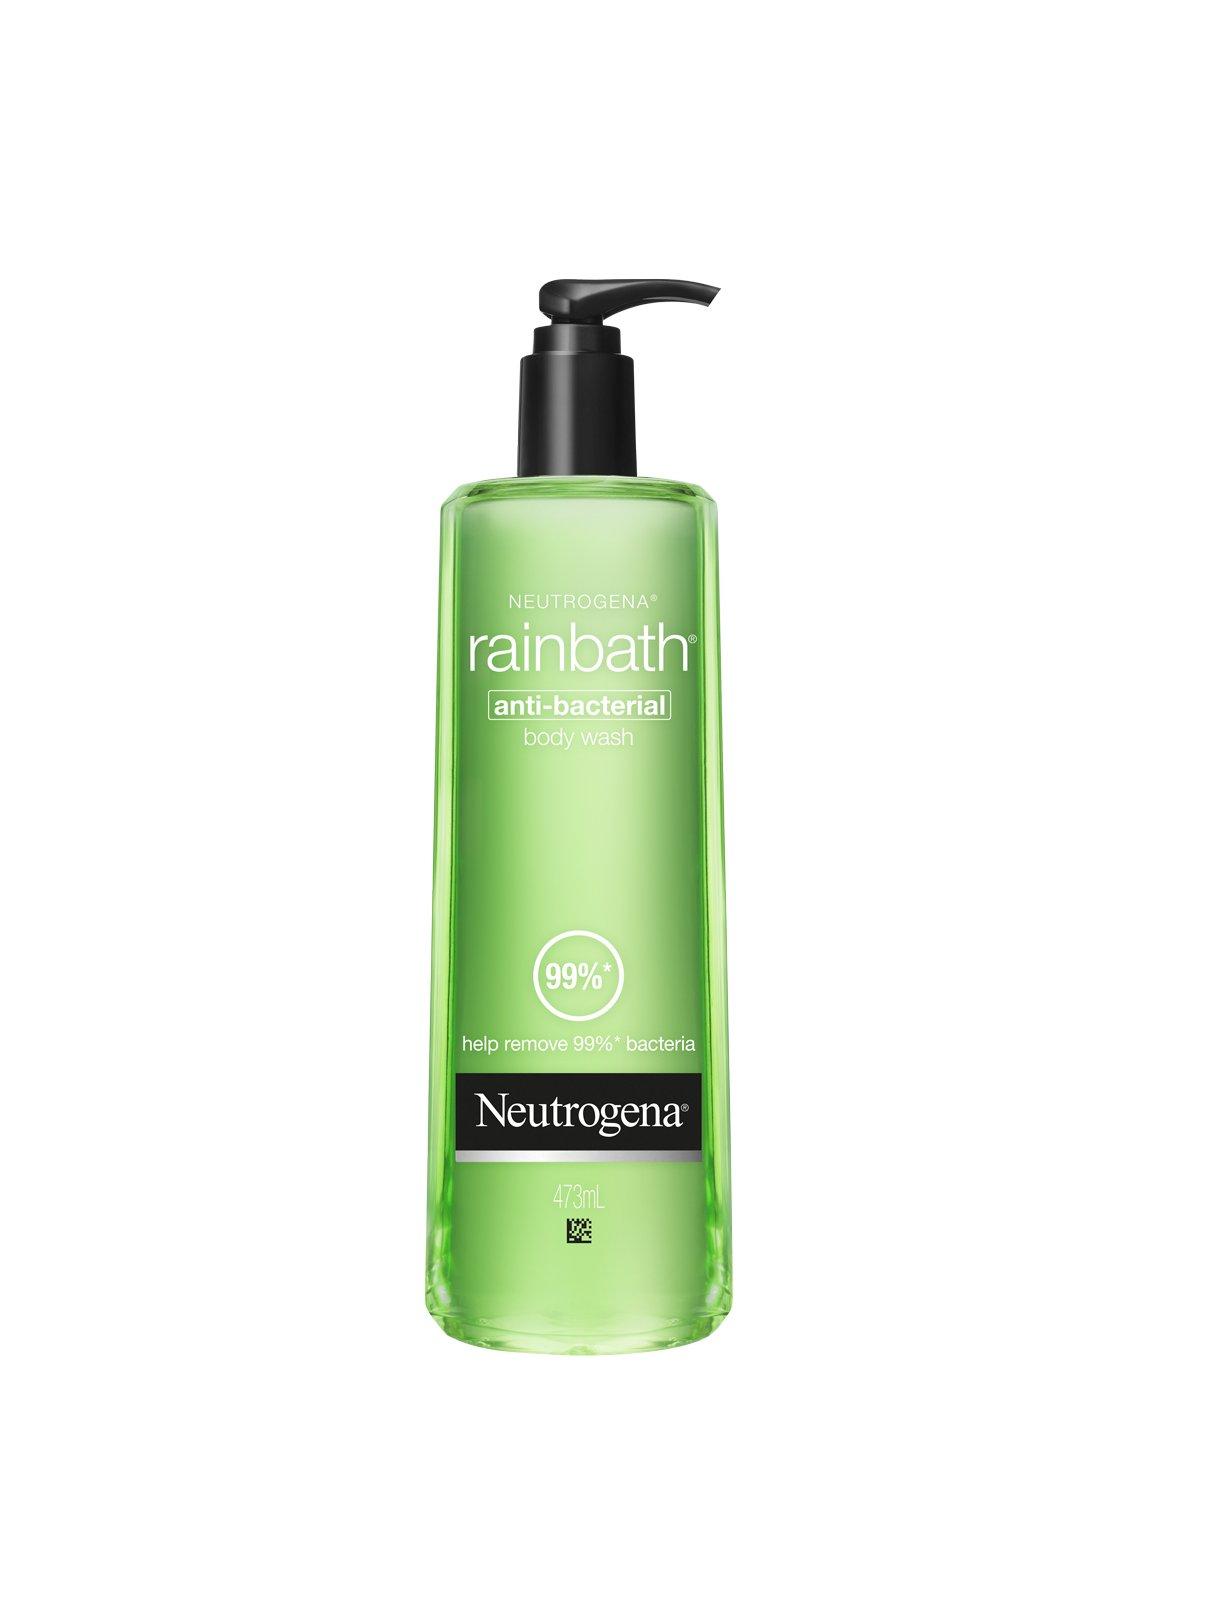 Neutrogena® Rainbath Anti-Bacterial Body Wash 473ml